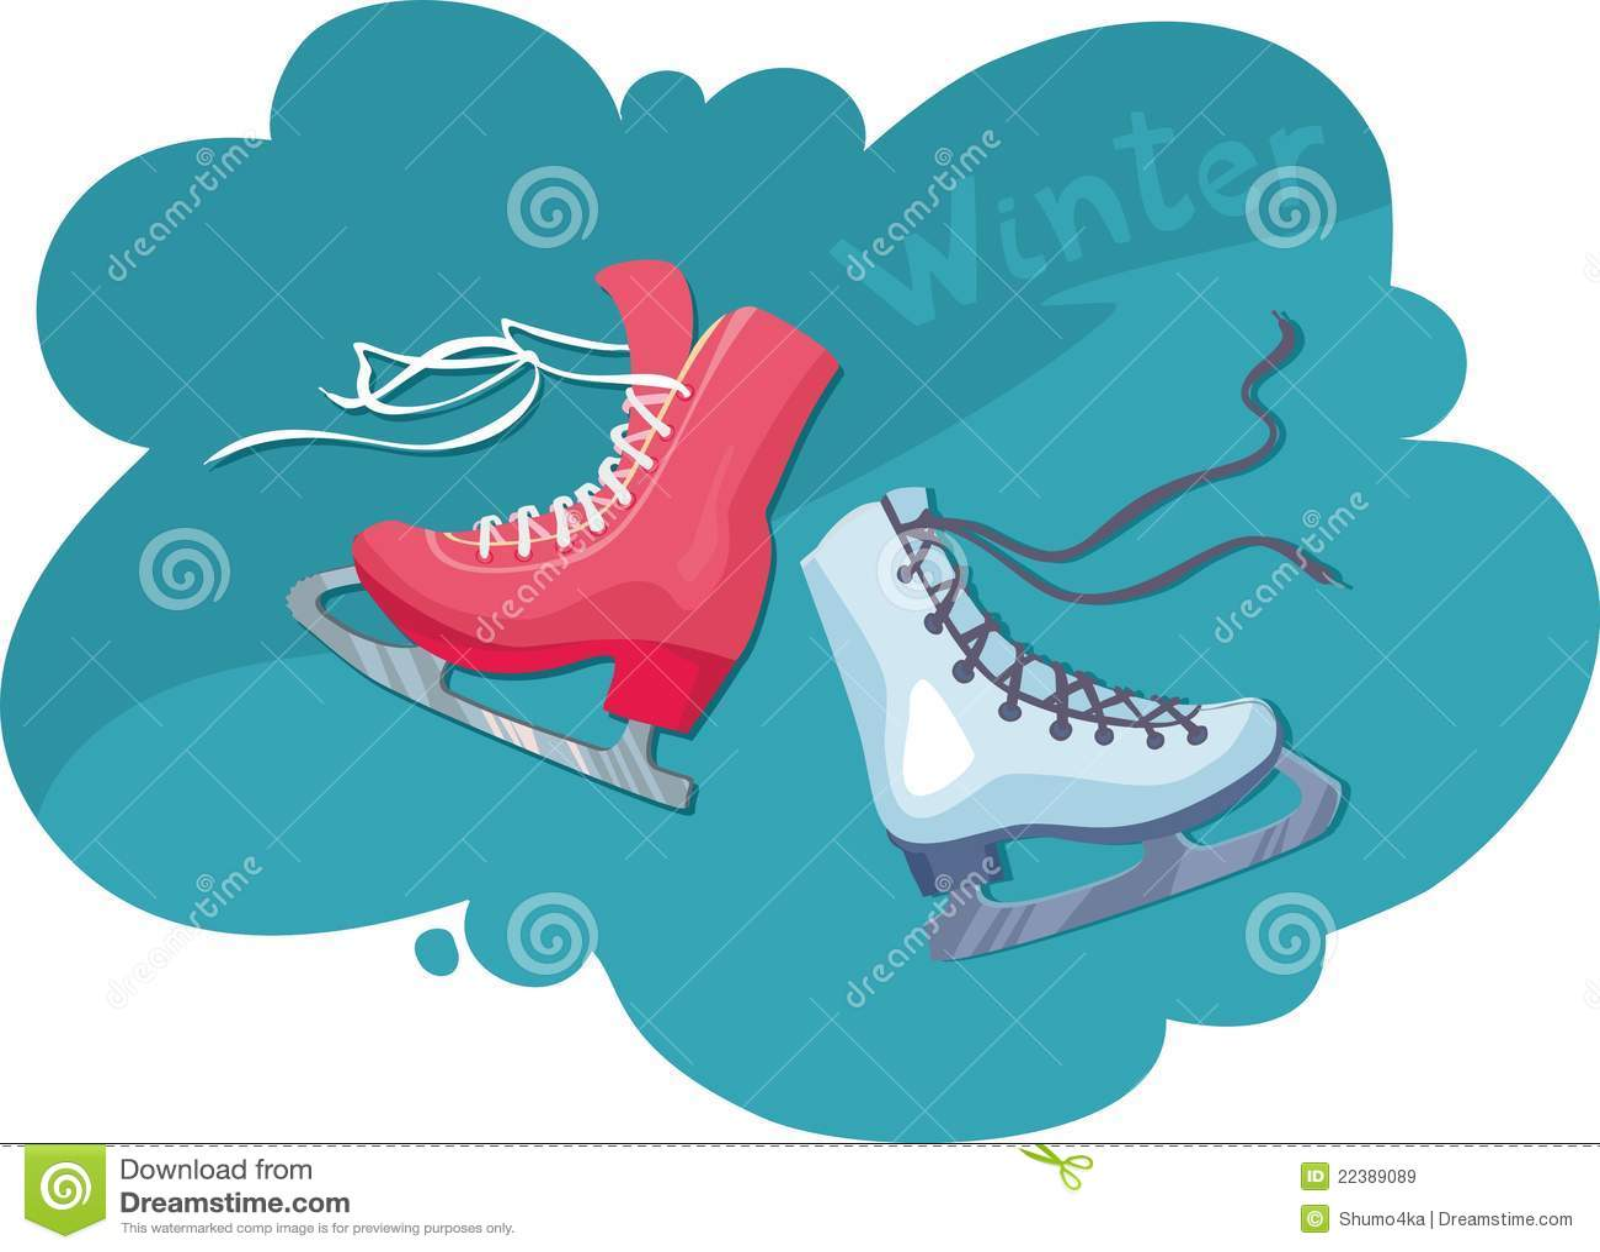 Roller skates for figure skating - Two Skates For Figure Skating Male And Female